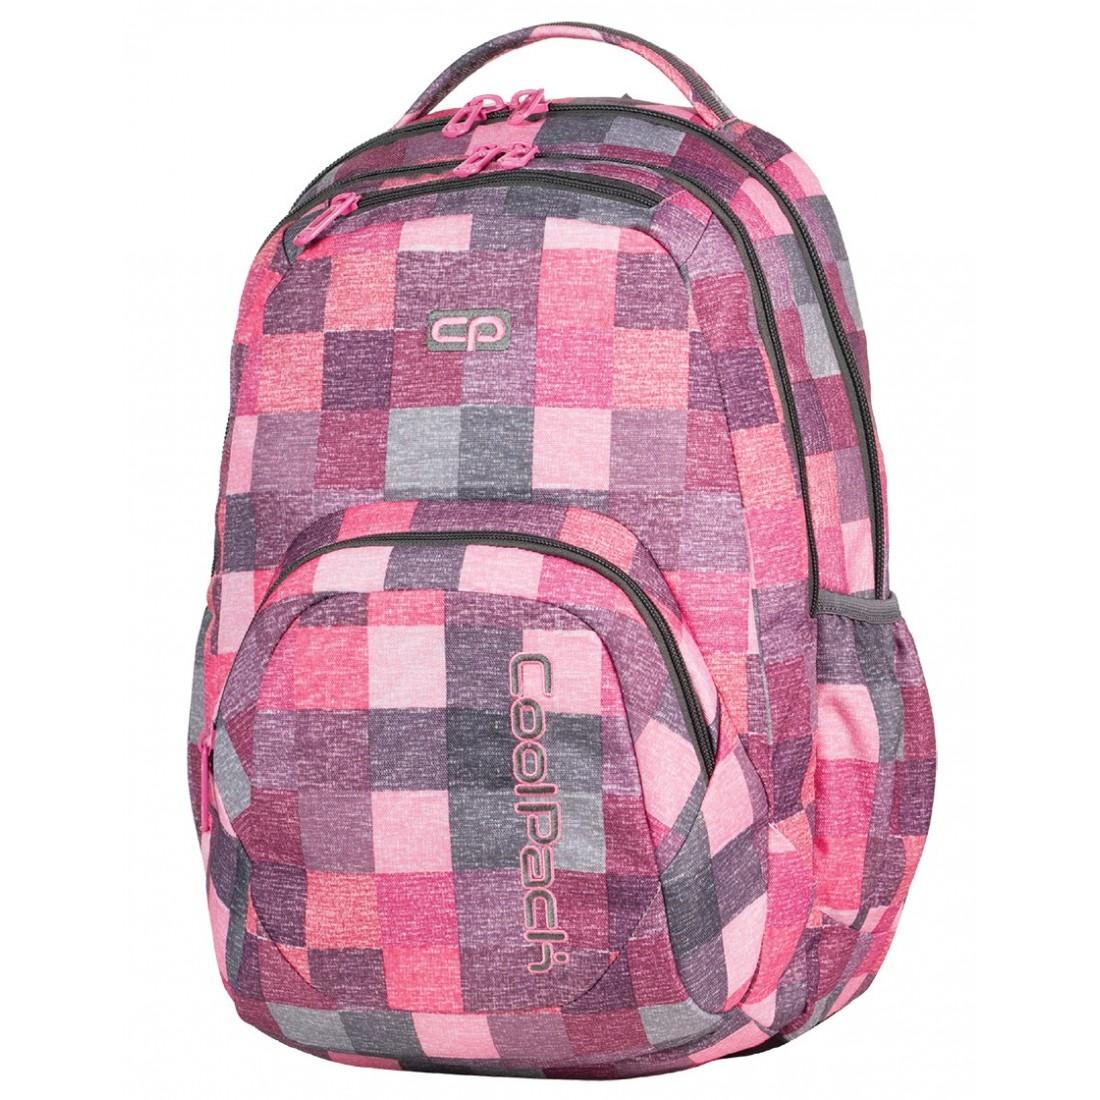 Plecak młodzieżowy CoolPack SMASH ROSE SHADES CP 409 - plecak-tornister.pl